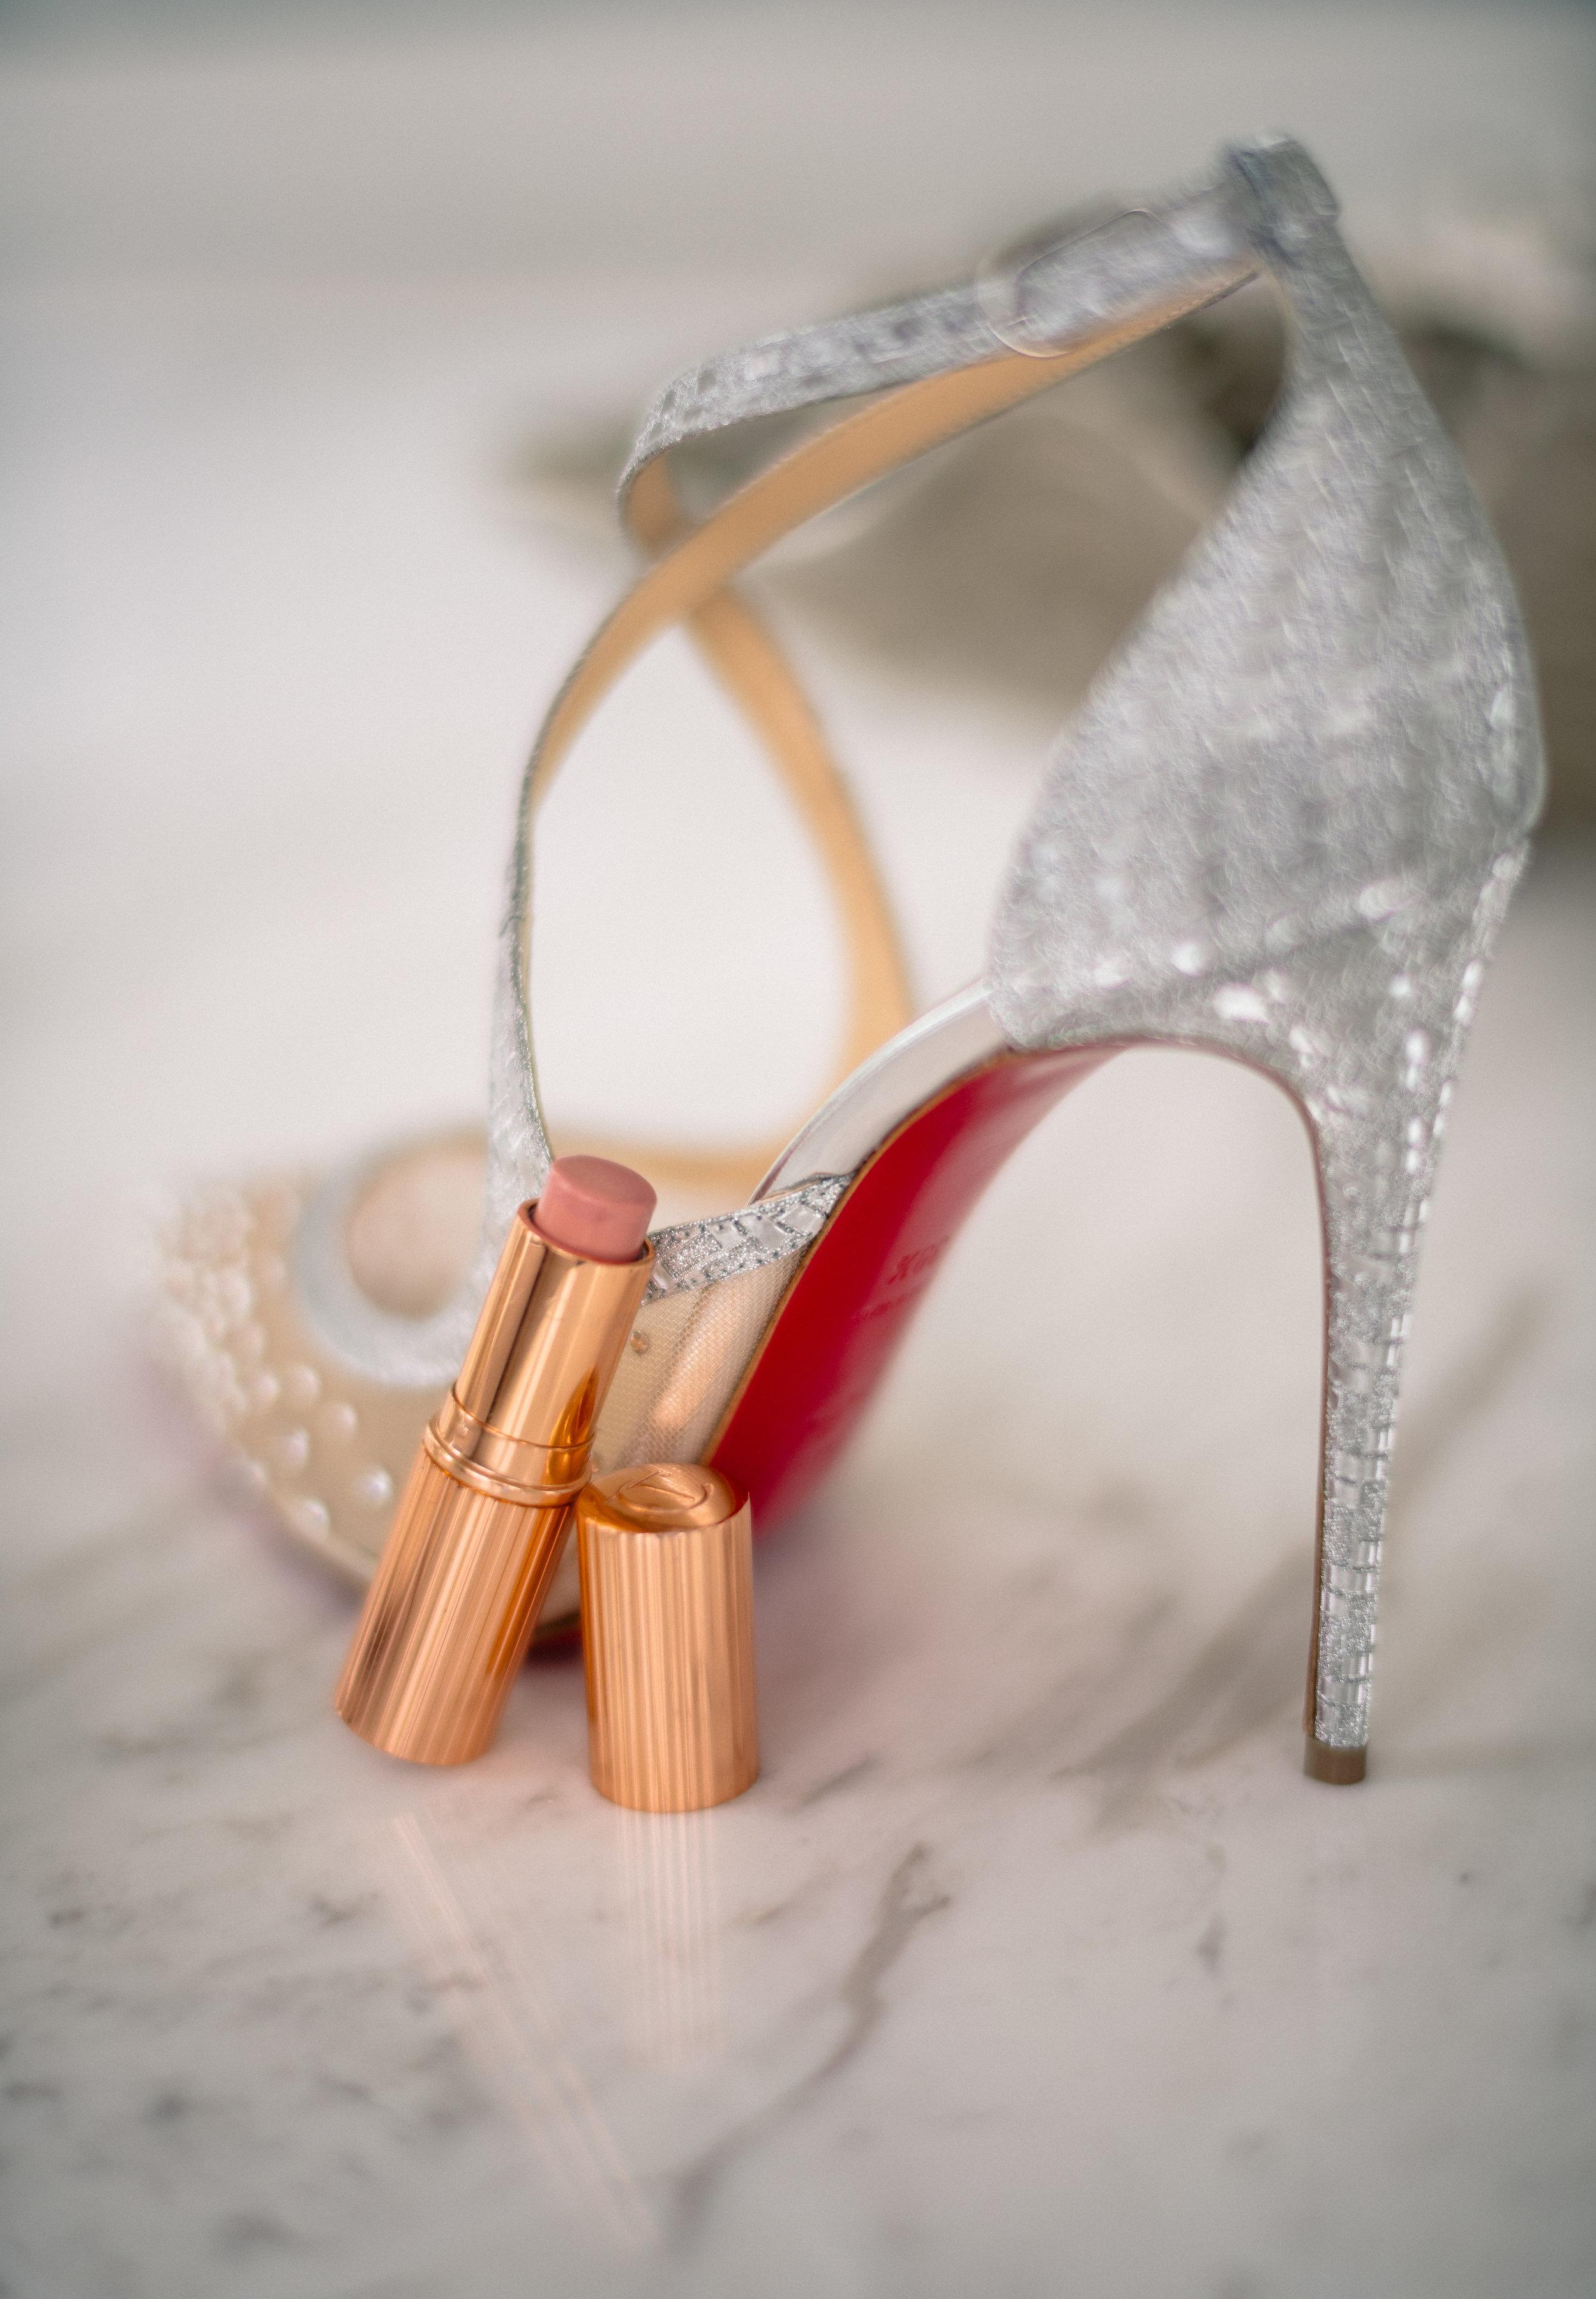 Christian Louboutin wedding shoes Turks Caicos photographer Matt Steeves.jpg